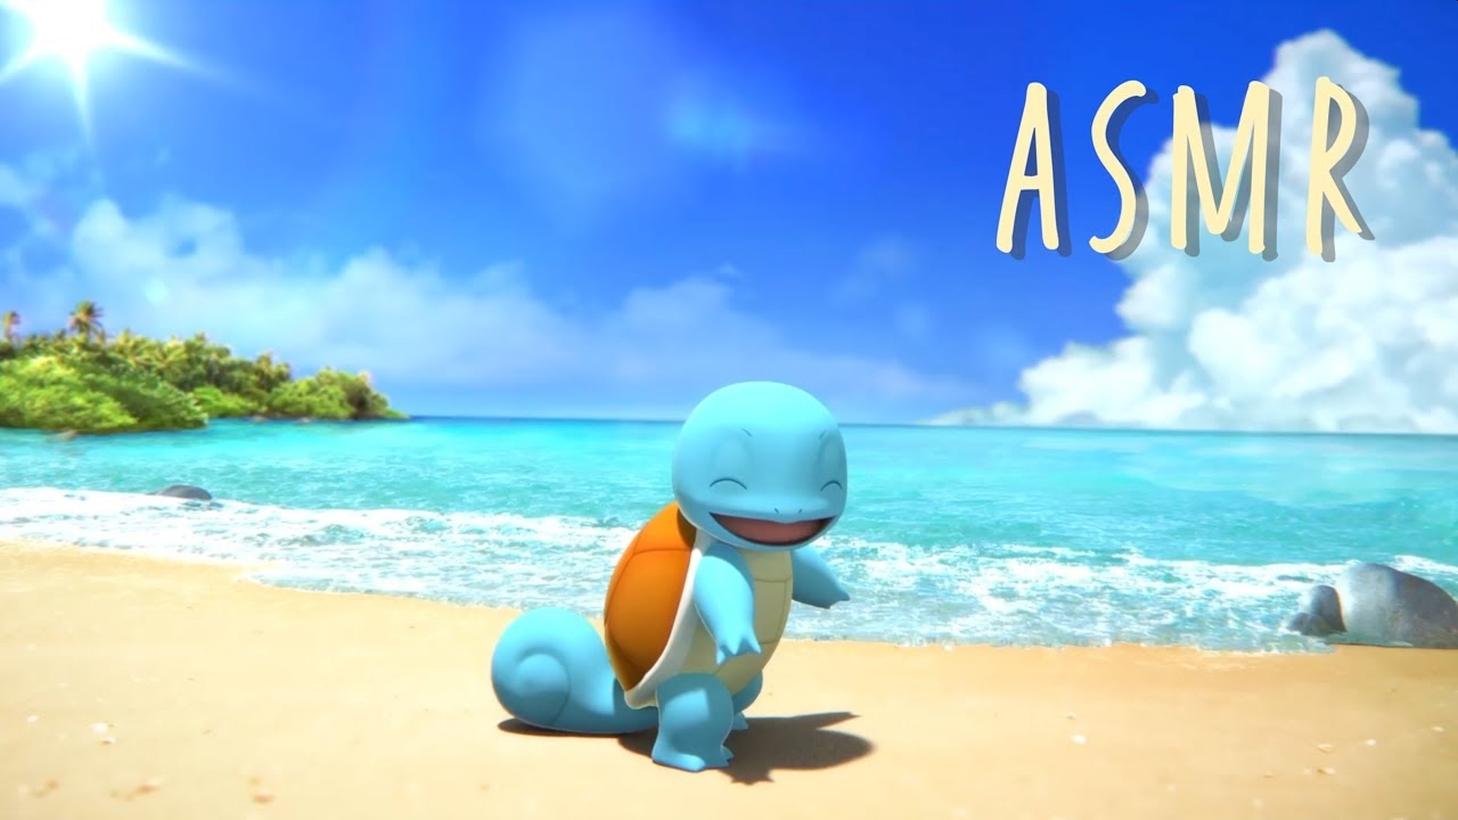 Pokémon Releases Series Of ASMR Videos Starring Pokémon In Various Relaxing Settings